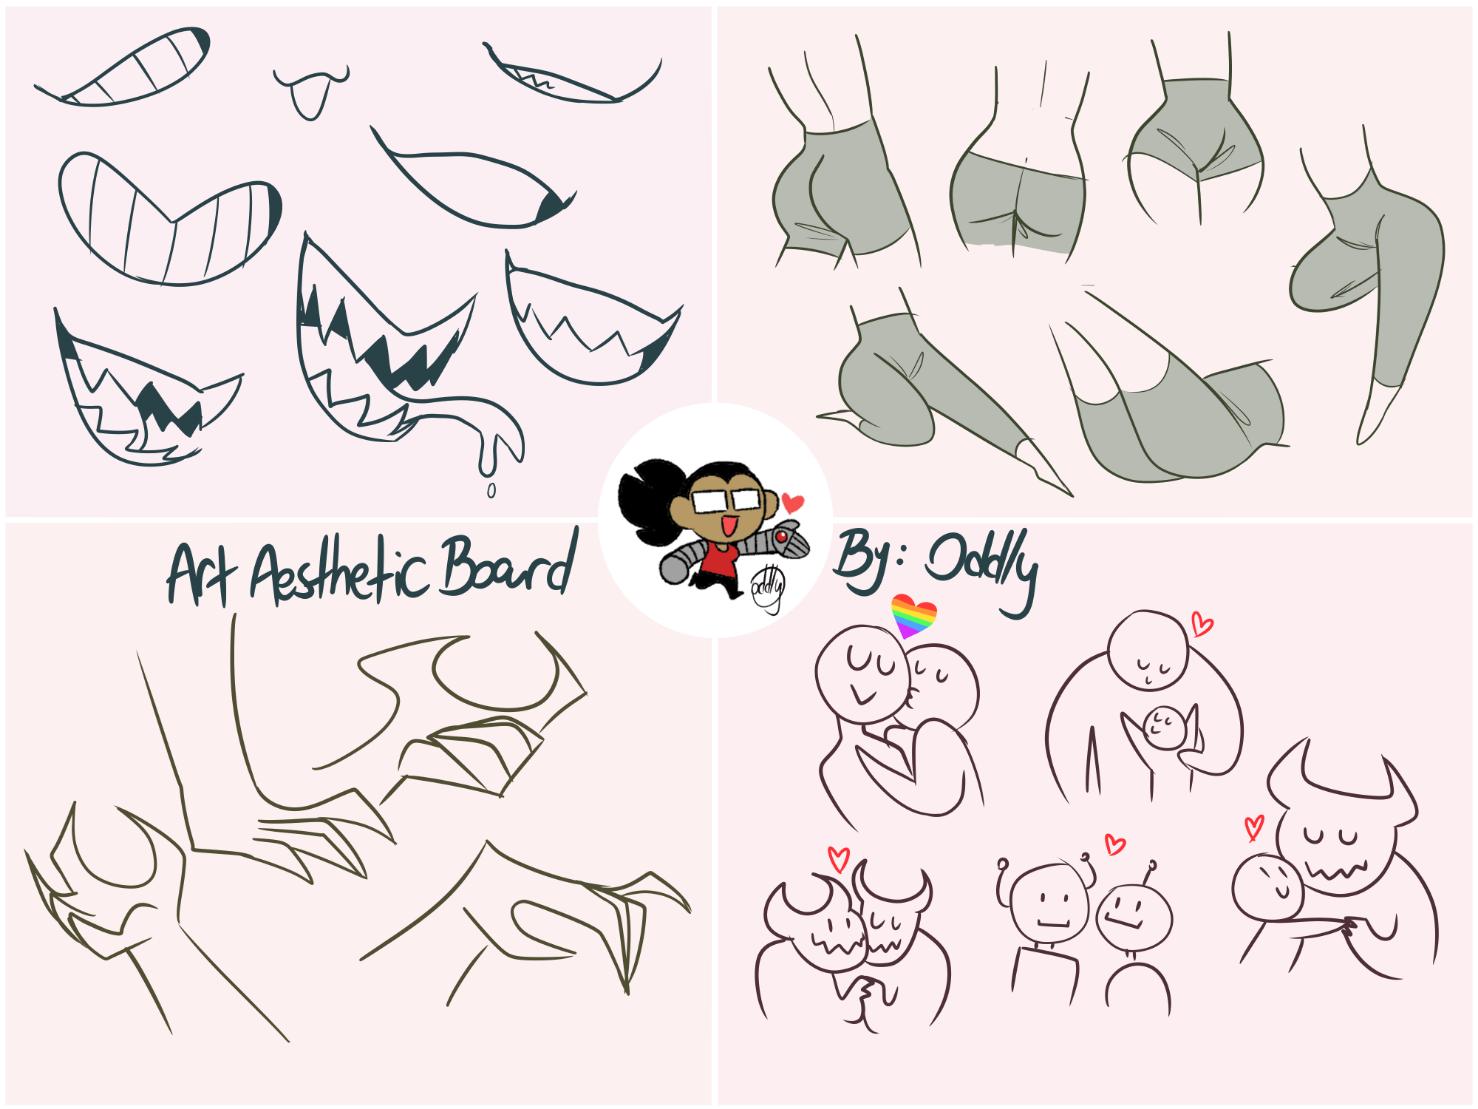 Oddly Exe I Made An Art Aesthetic Board Recently Basically Mastodon Art